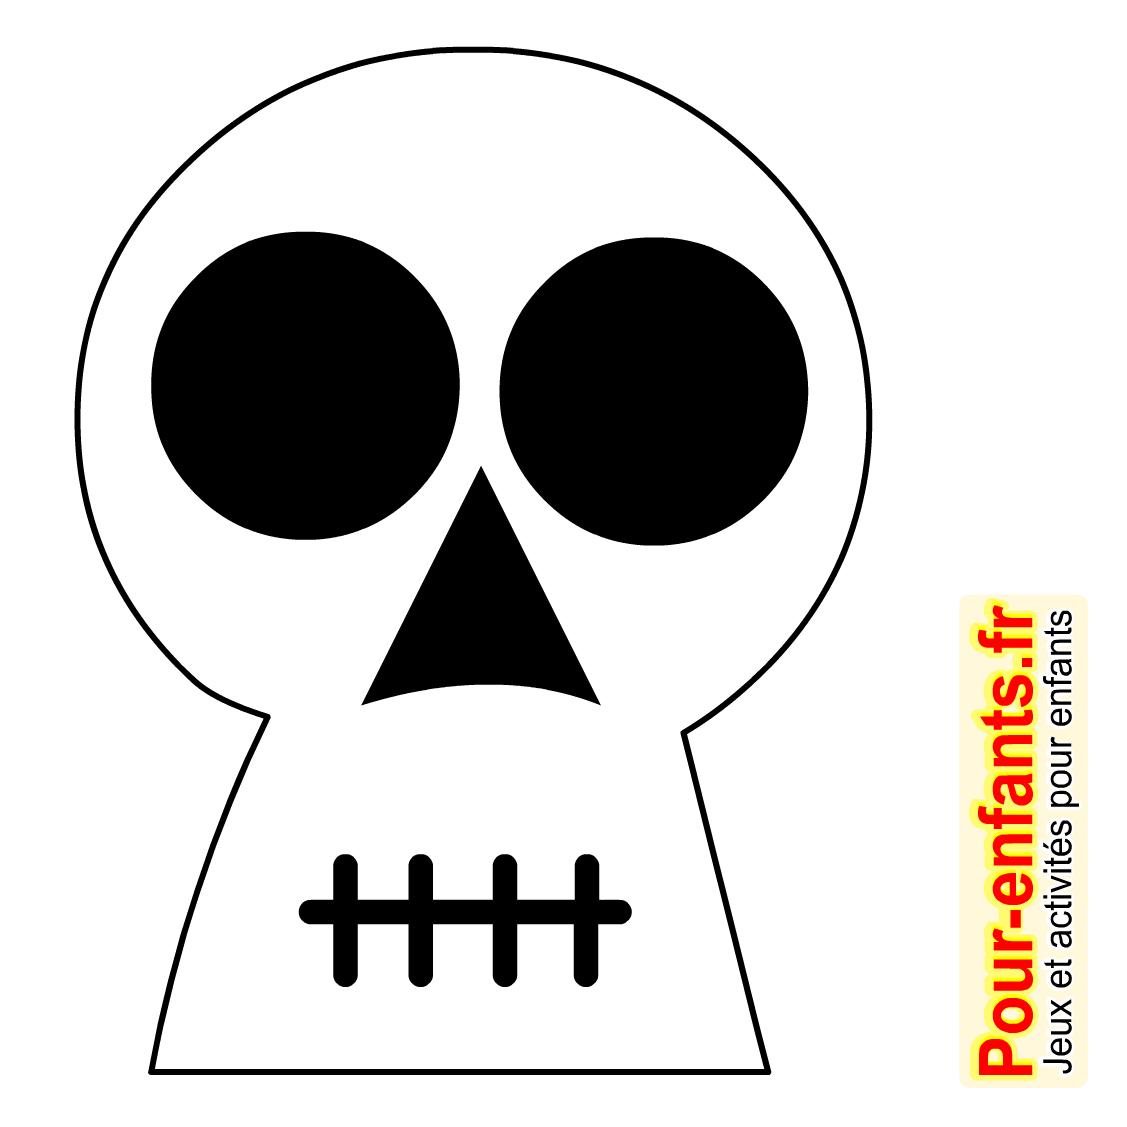 Dessins Tête De Mort Dessin Coloriage Tete De Mort Halloween avec Dessin D Halloween Facile A Dessiner